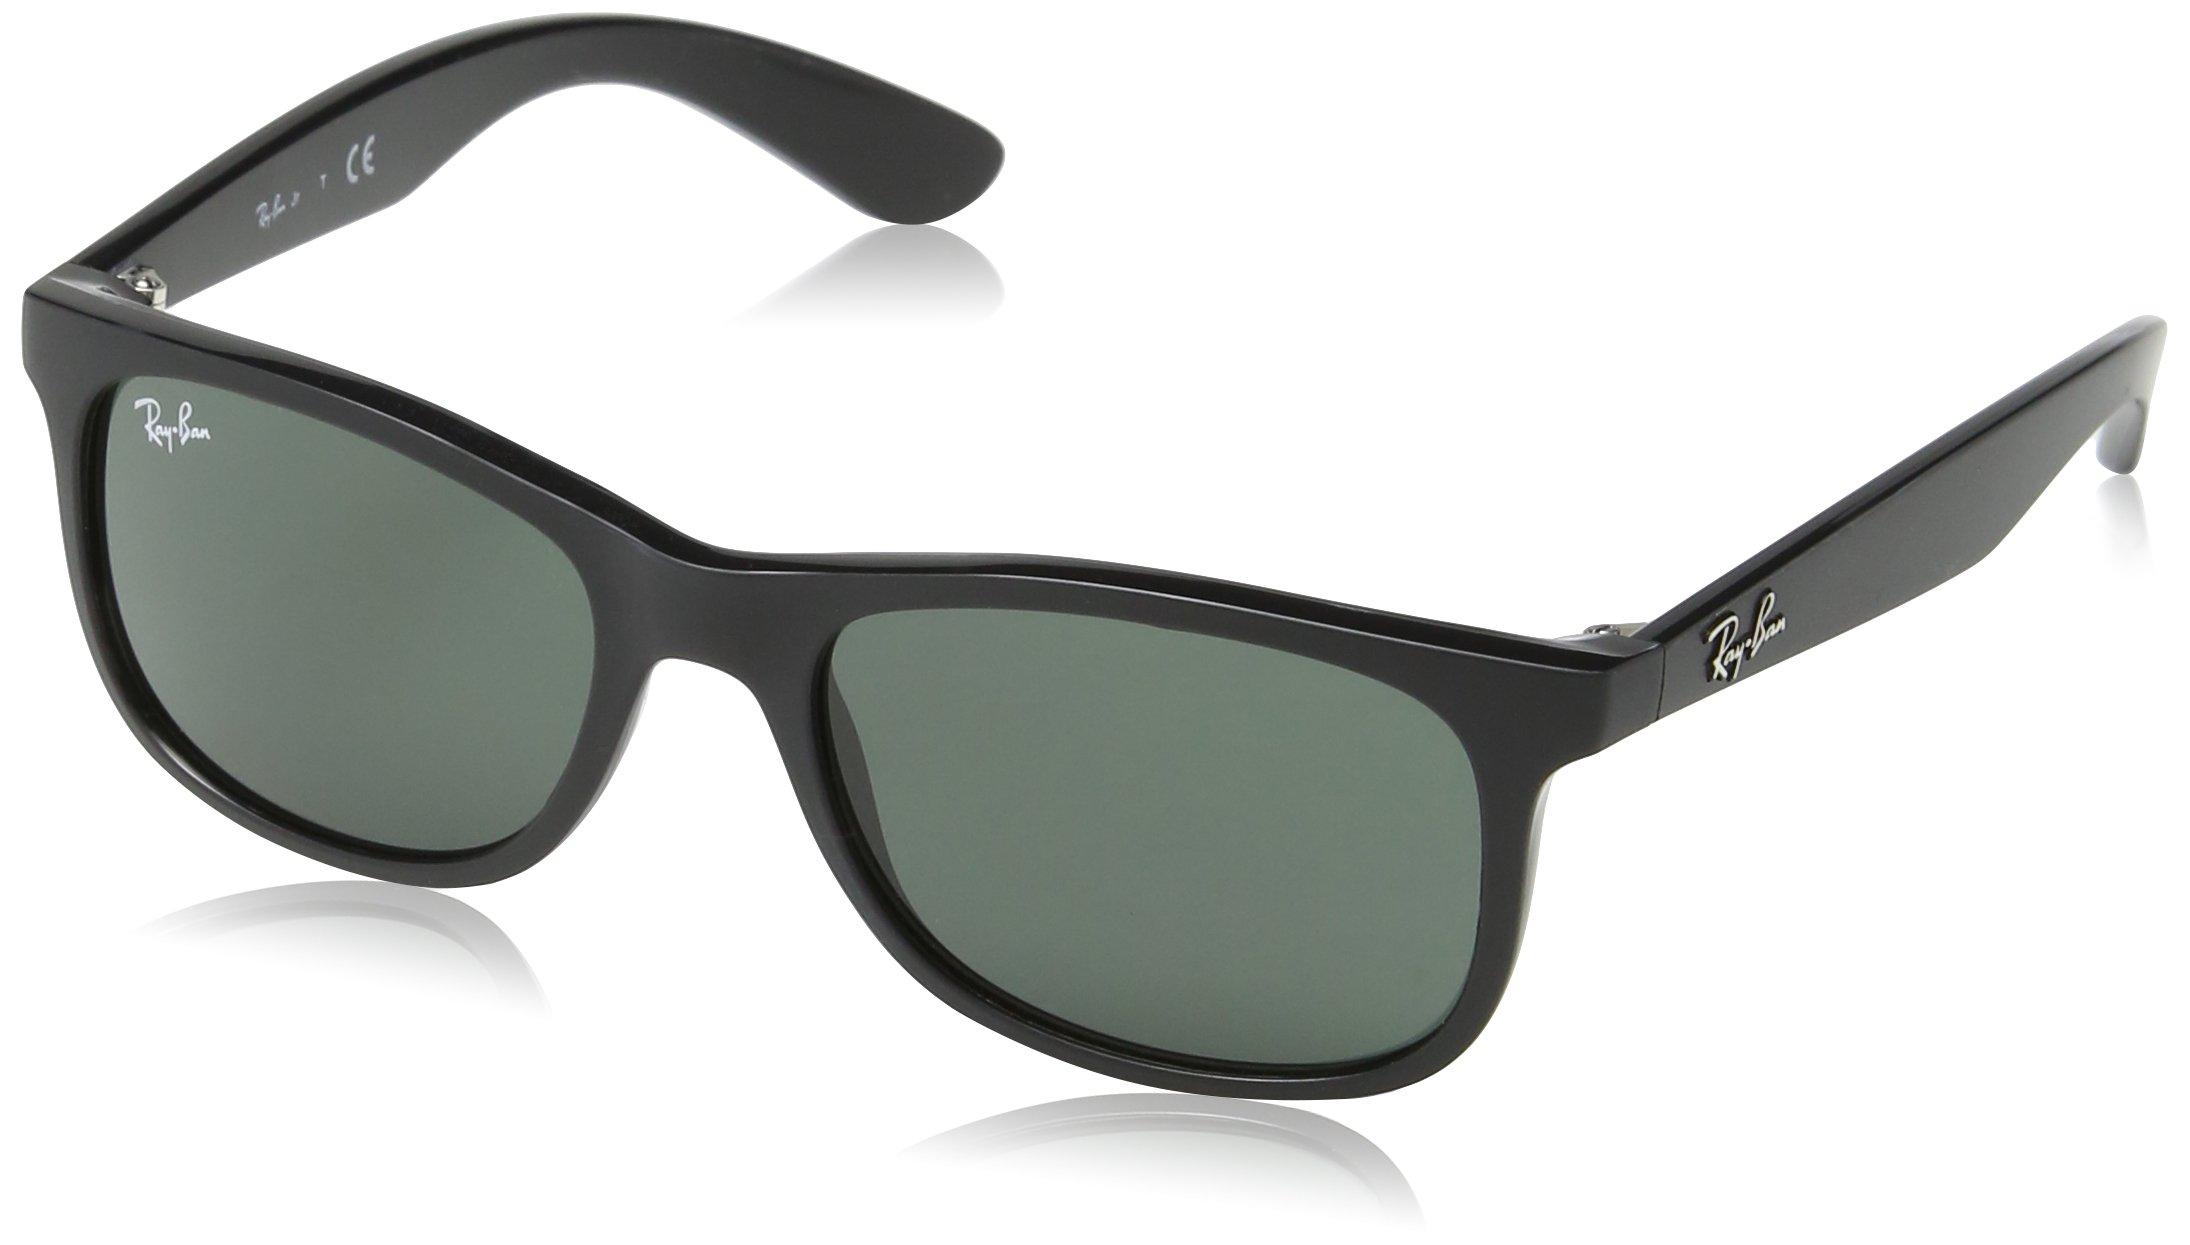 Ray-Ban Junior RJ9062S Rectangular Kids Sunglasses, Matte Black/Green, 48 mm